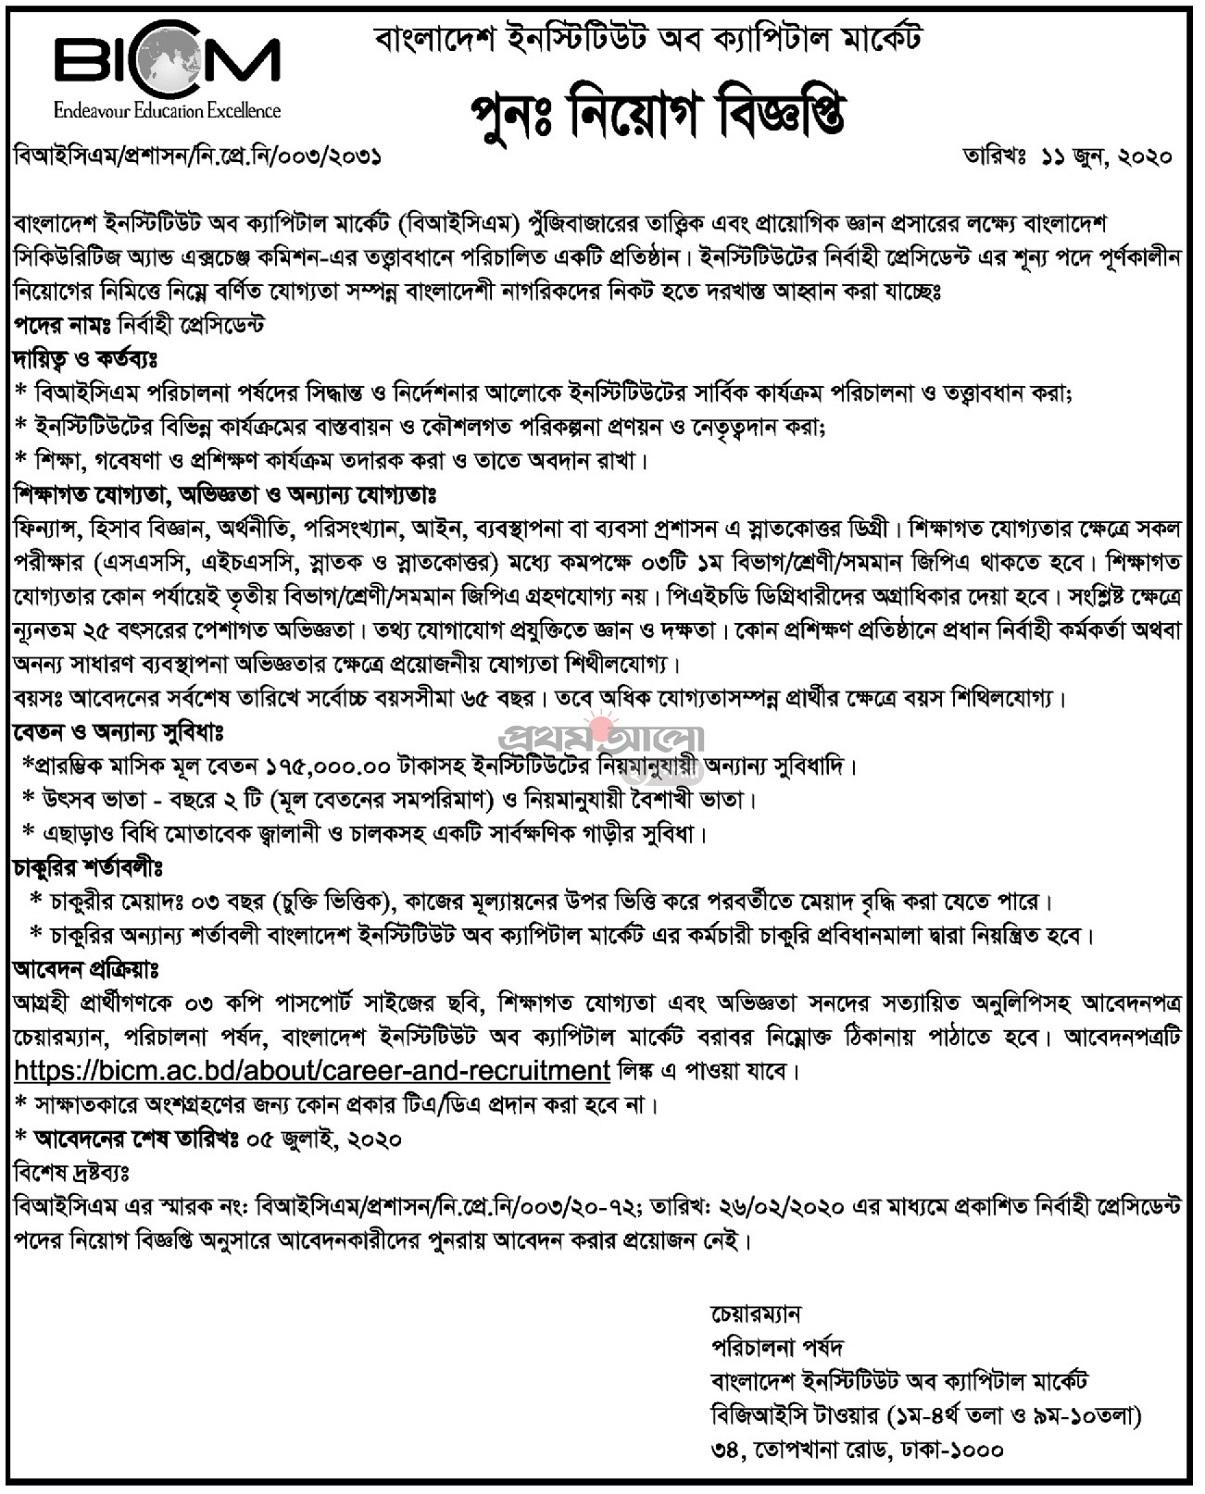 Bangladesh Institute of Capital Market Job Circular 2020